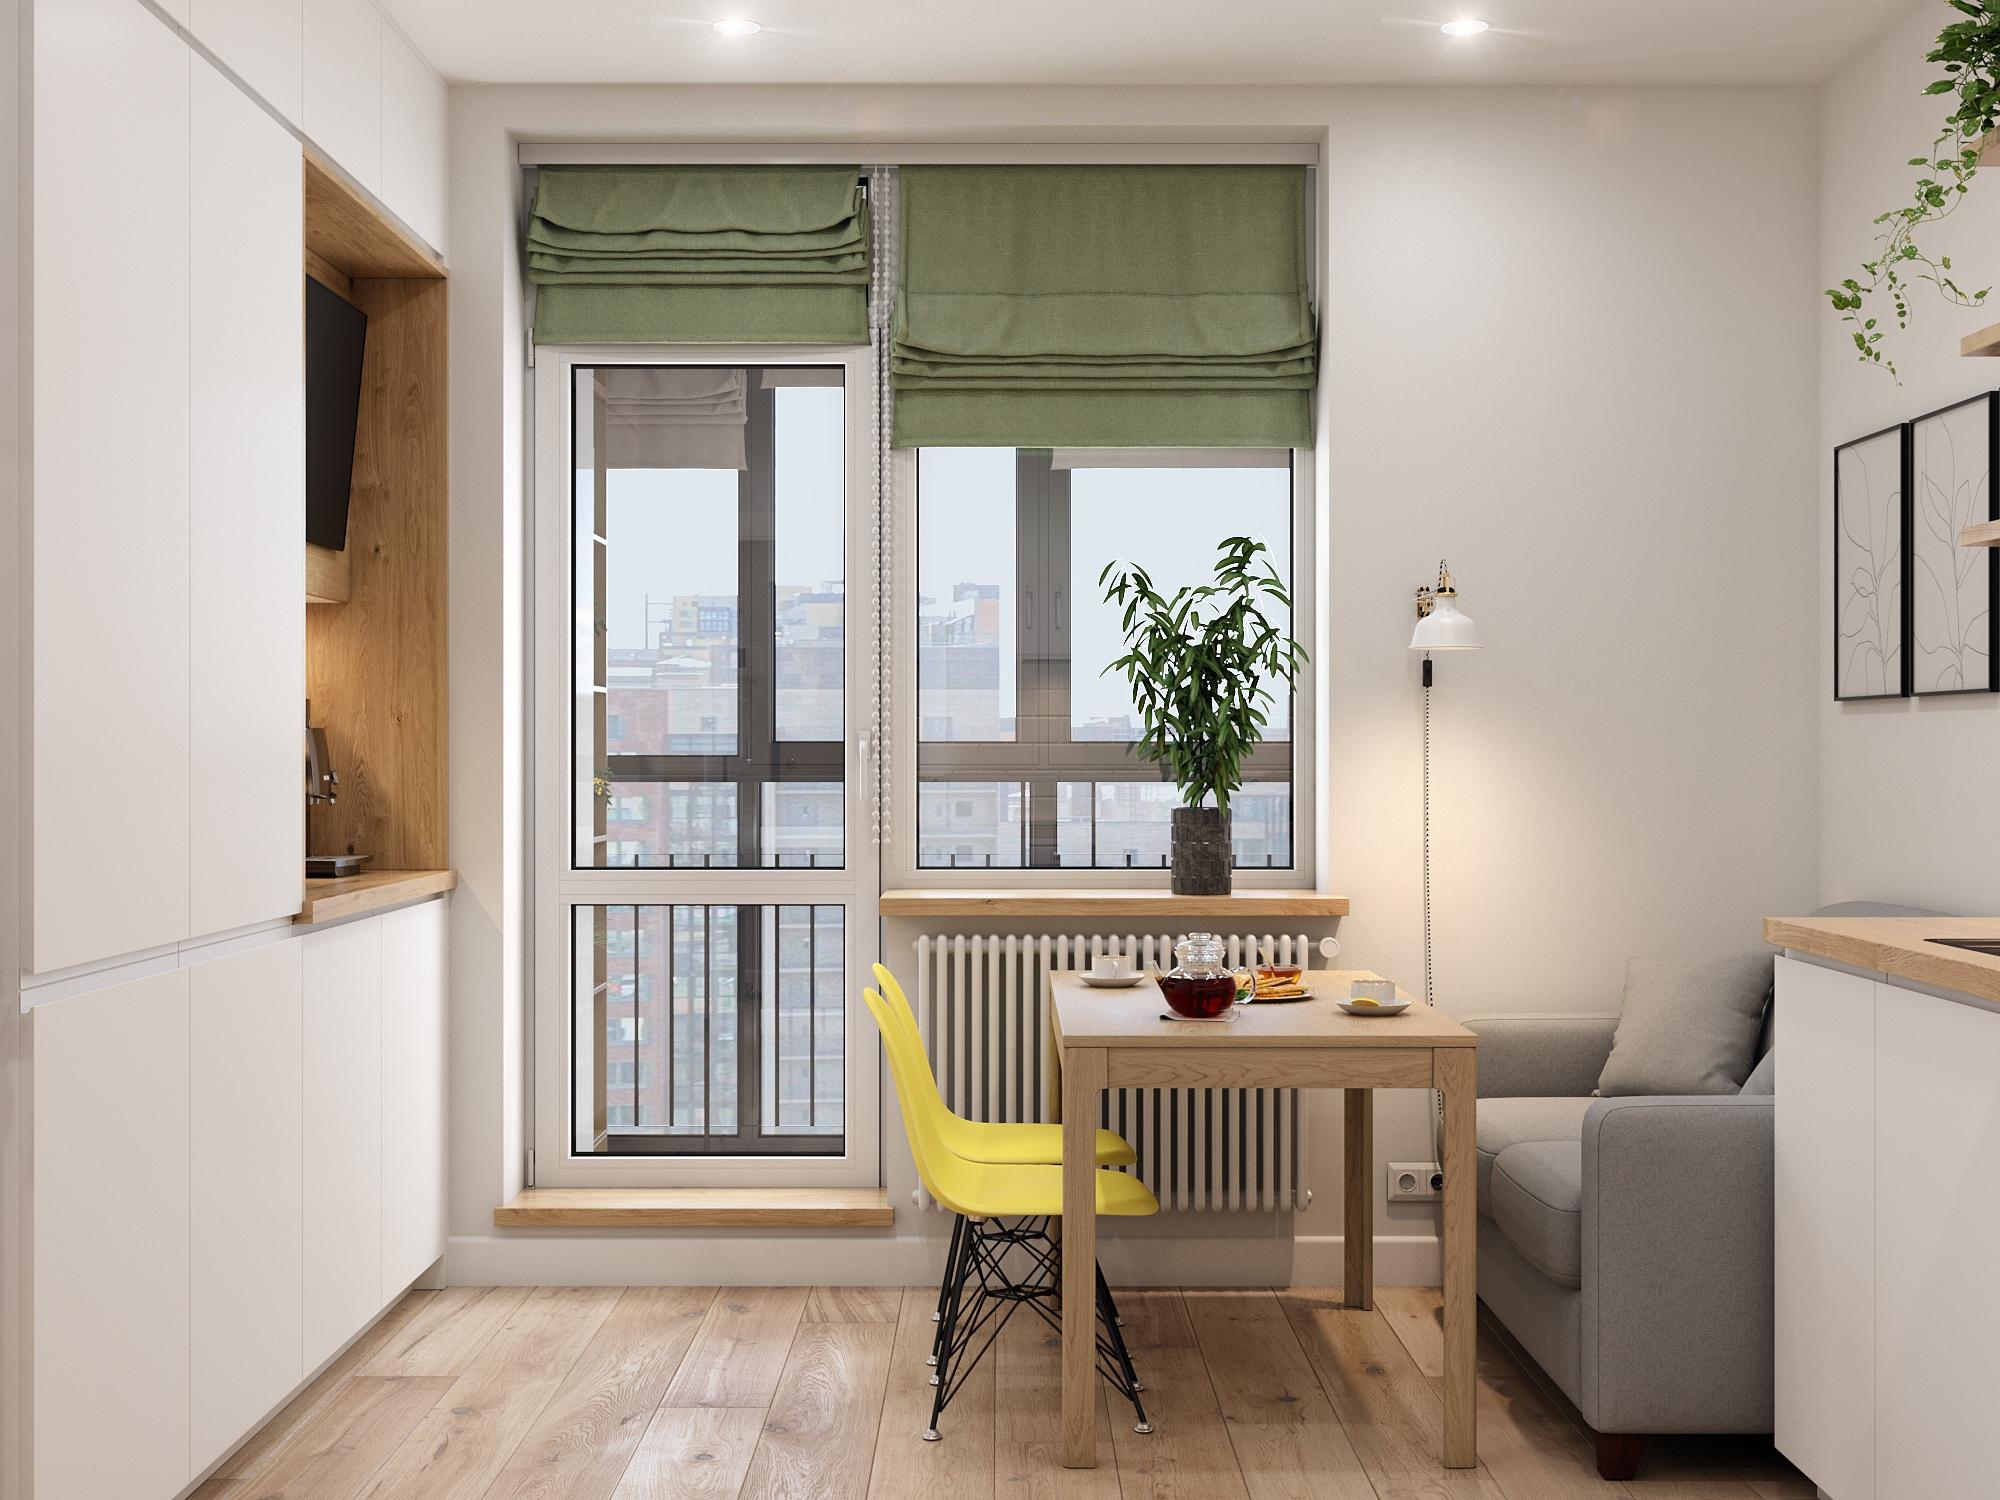 Проект однокомнатной квартиры 44 кв.